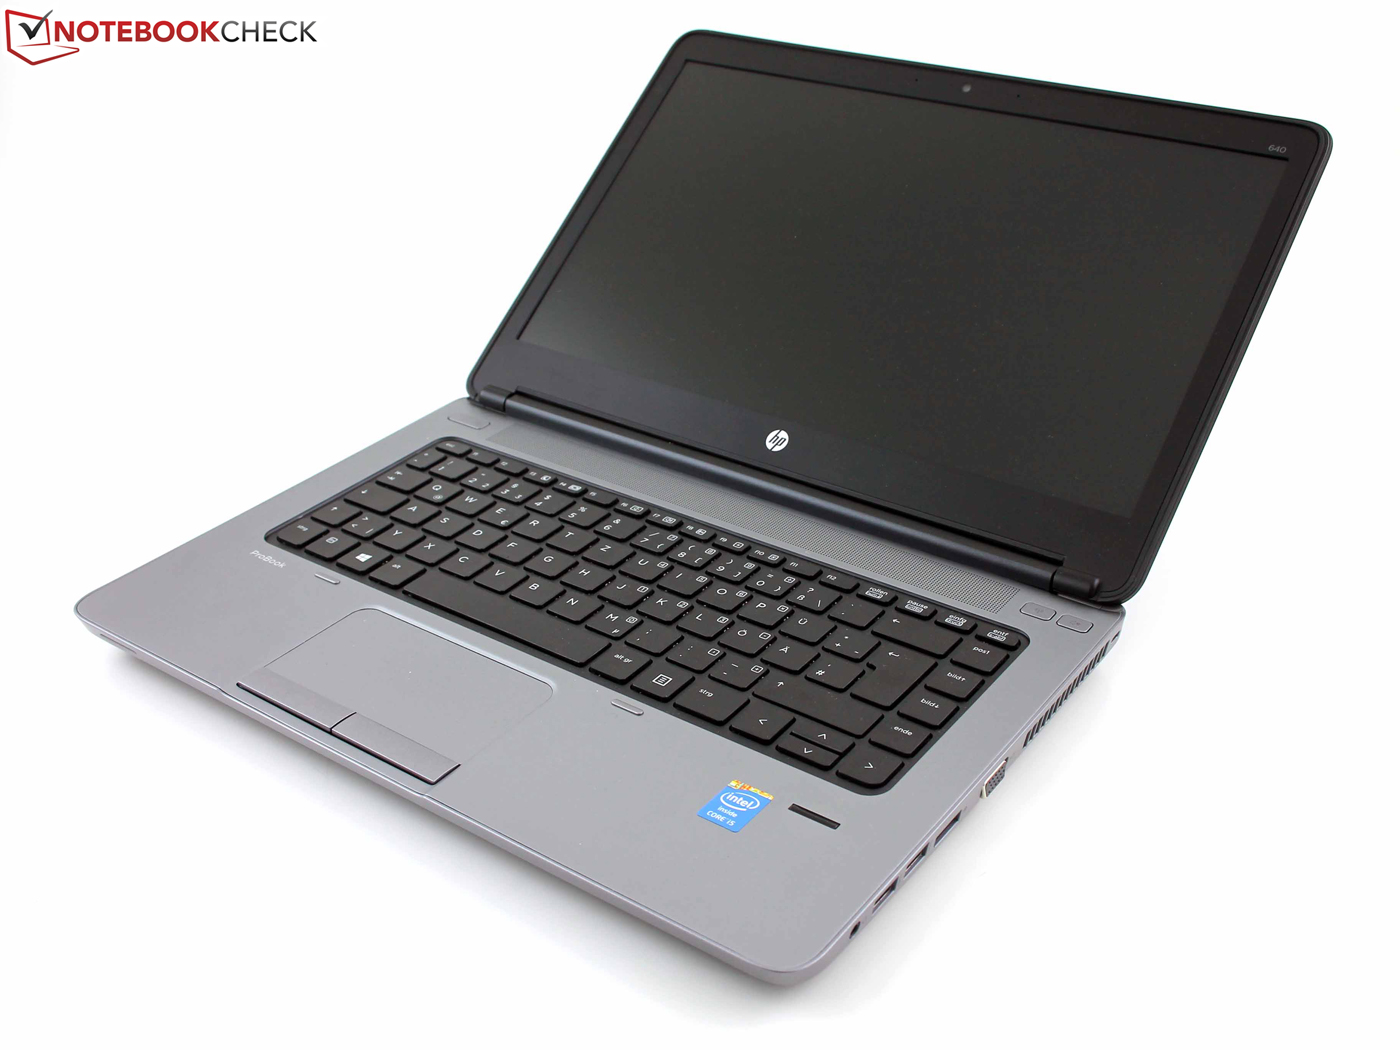 Recenzja Hp Probook 640 Notebookcheck Pl